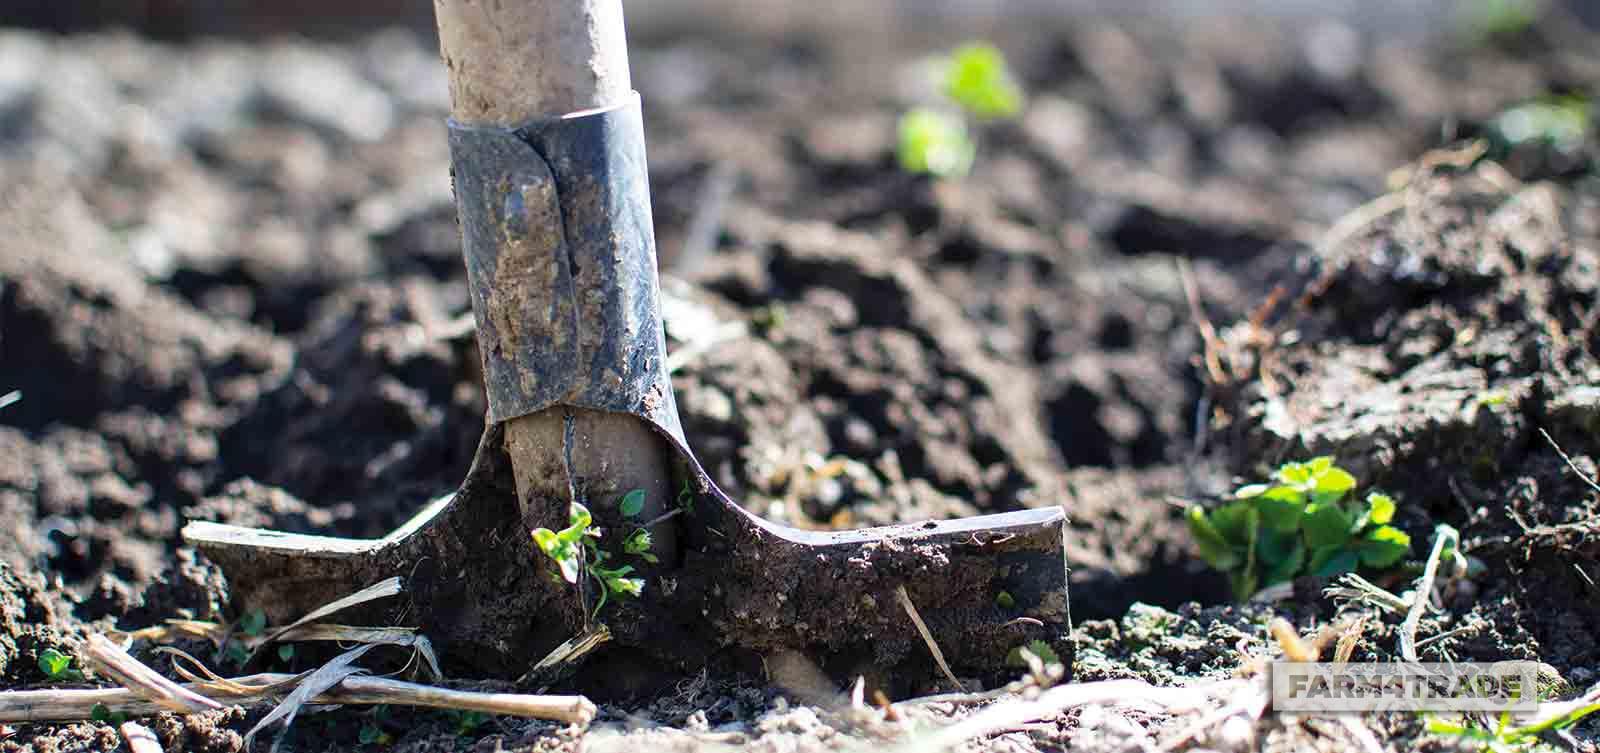 Organic farming-Biochar amendment - Farm4Trade